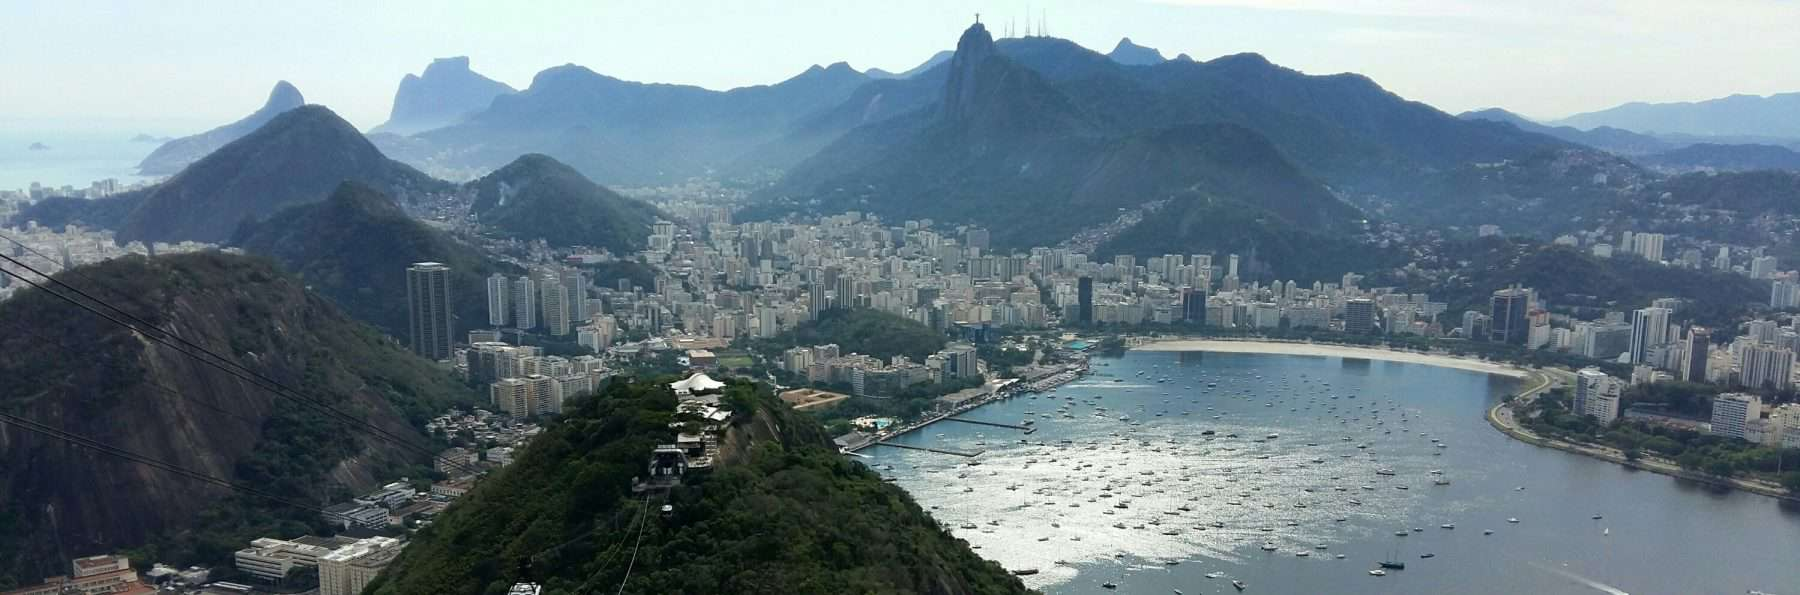 View from Sugarloaf Mountain, Rio de Janeiro, Brazil